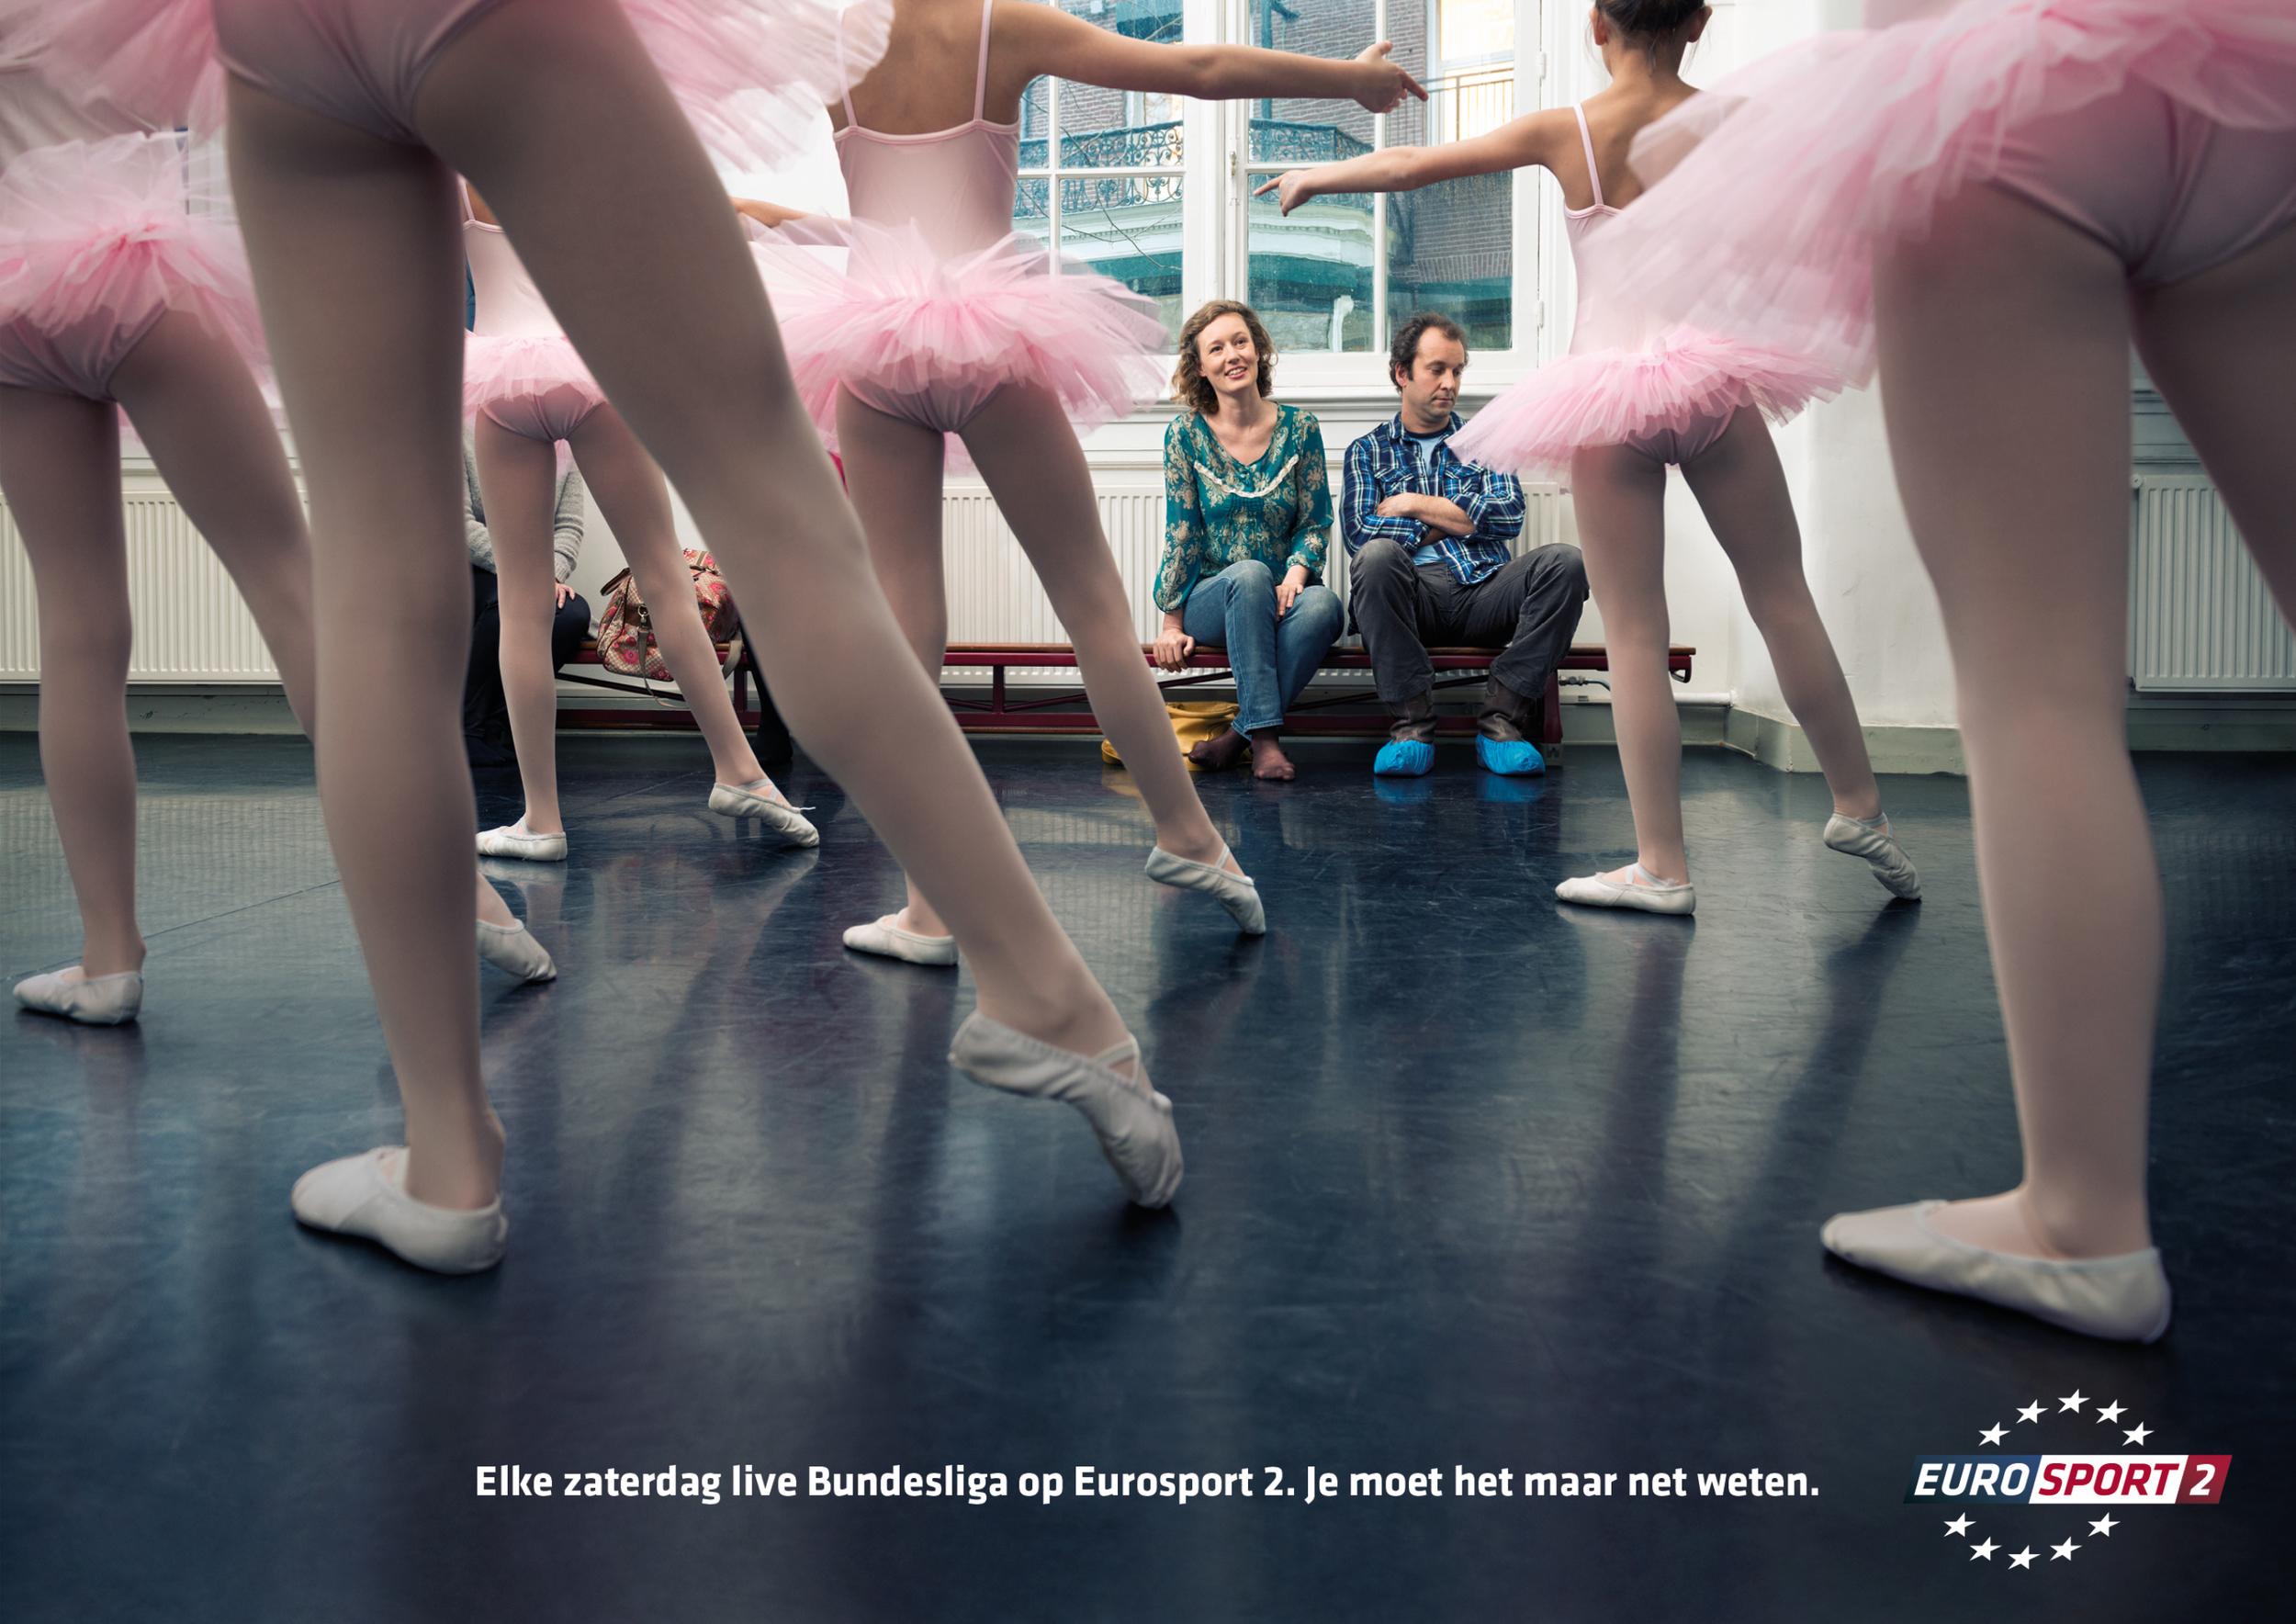 Eurosport_print_Ballet.jpg